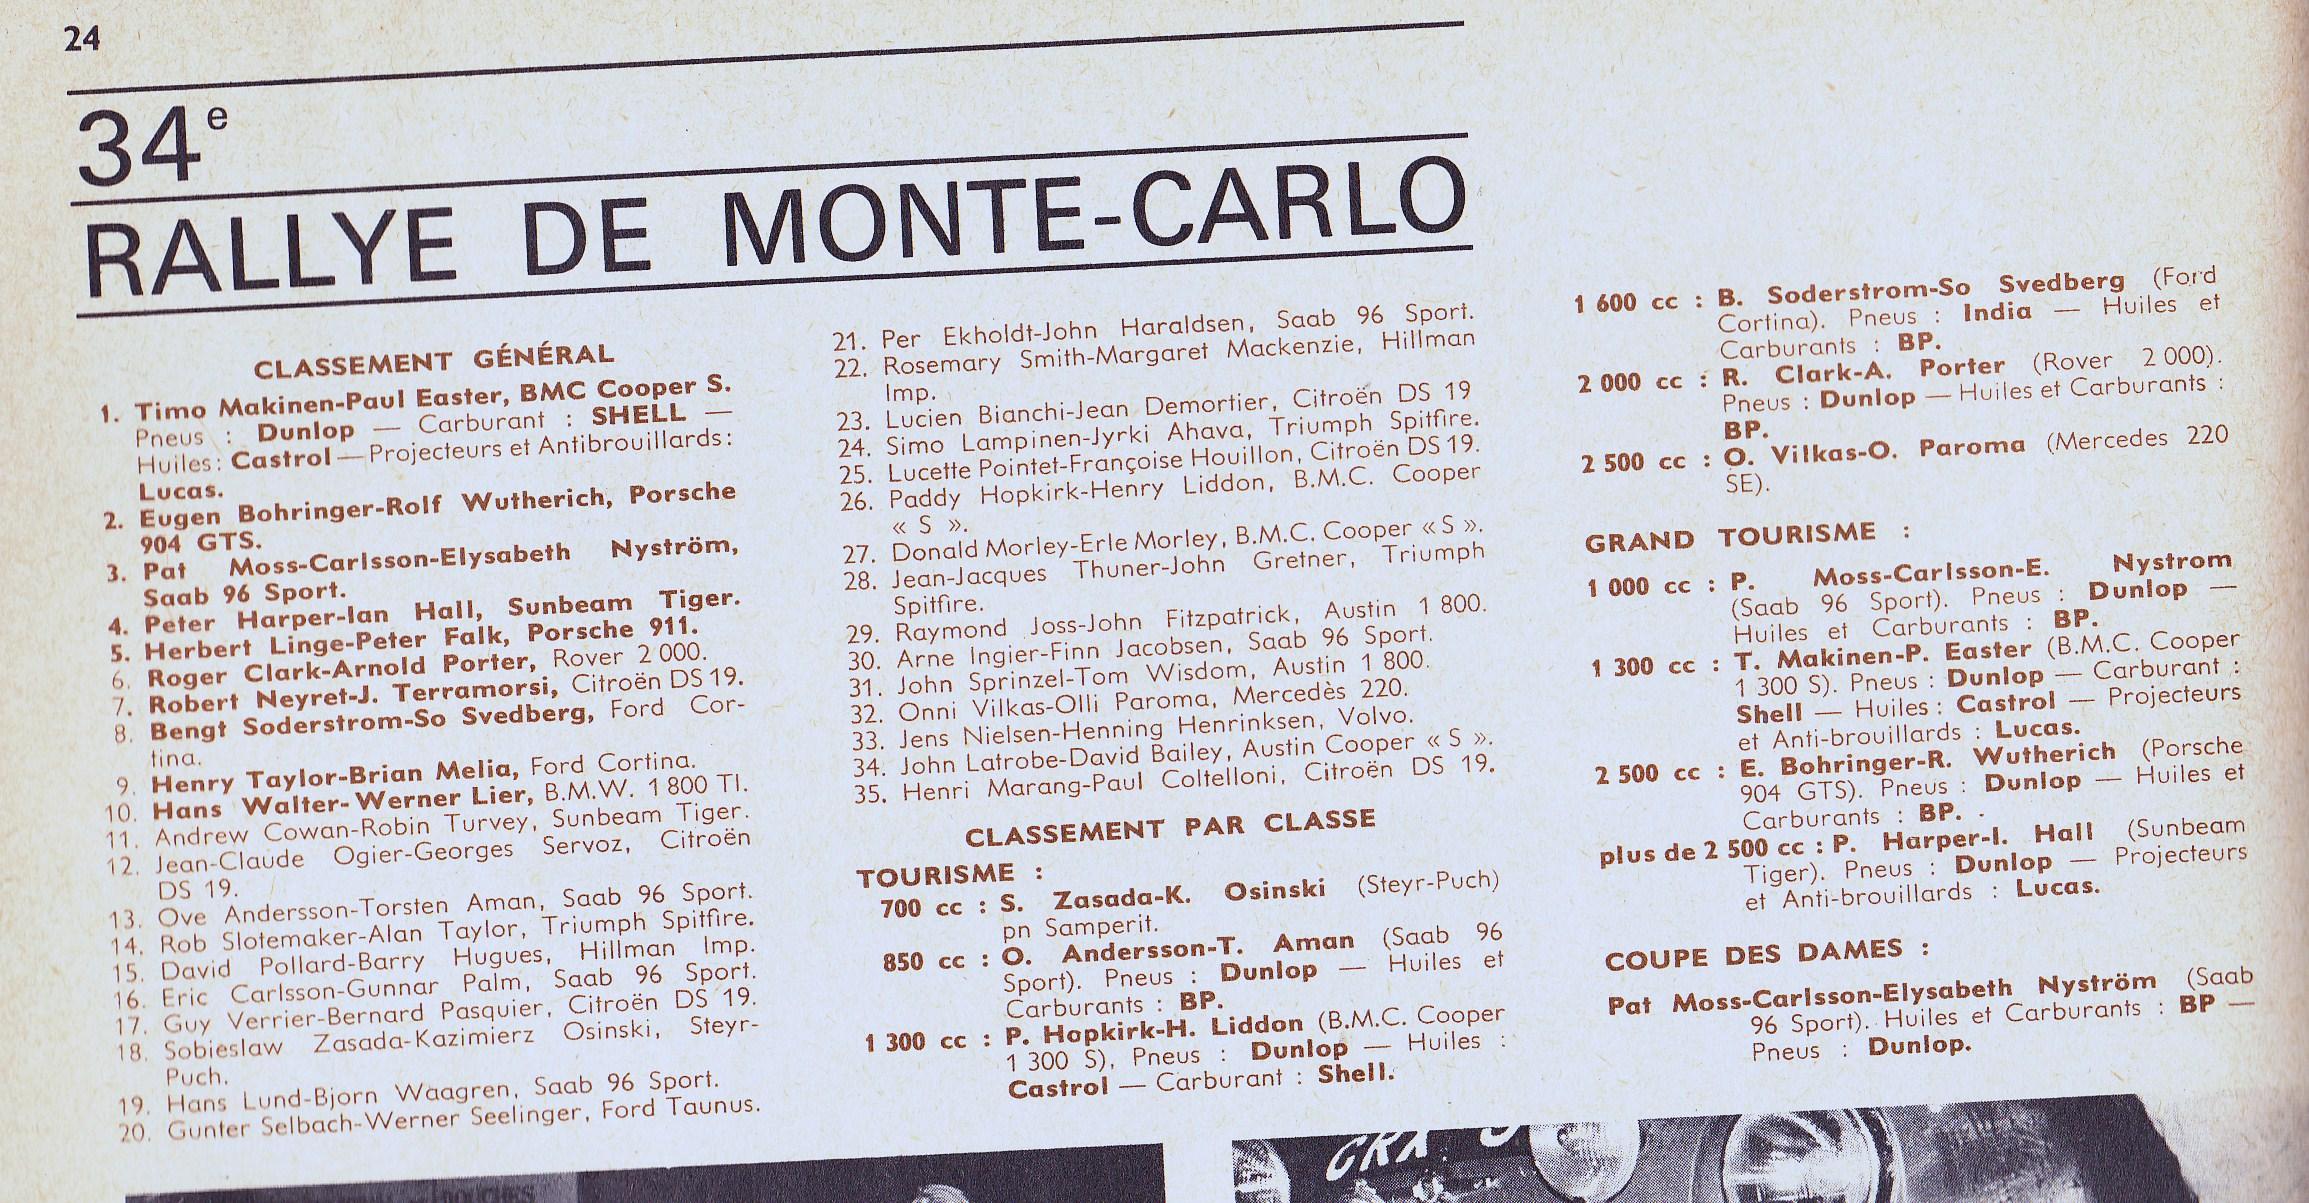 Rallye de Monte Carlo 1965 Results